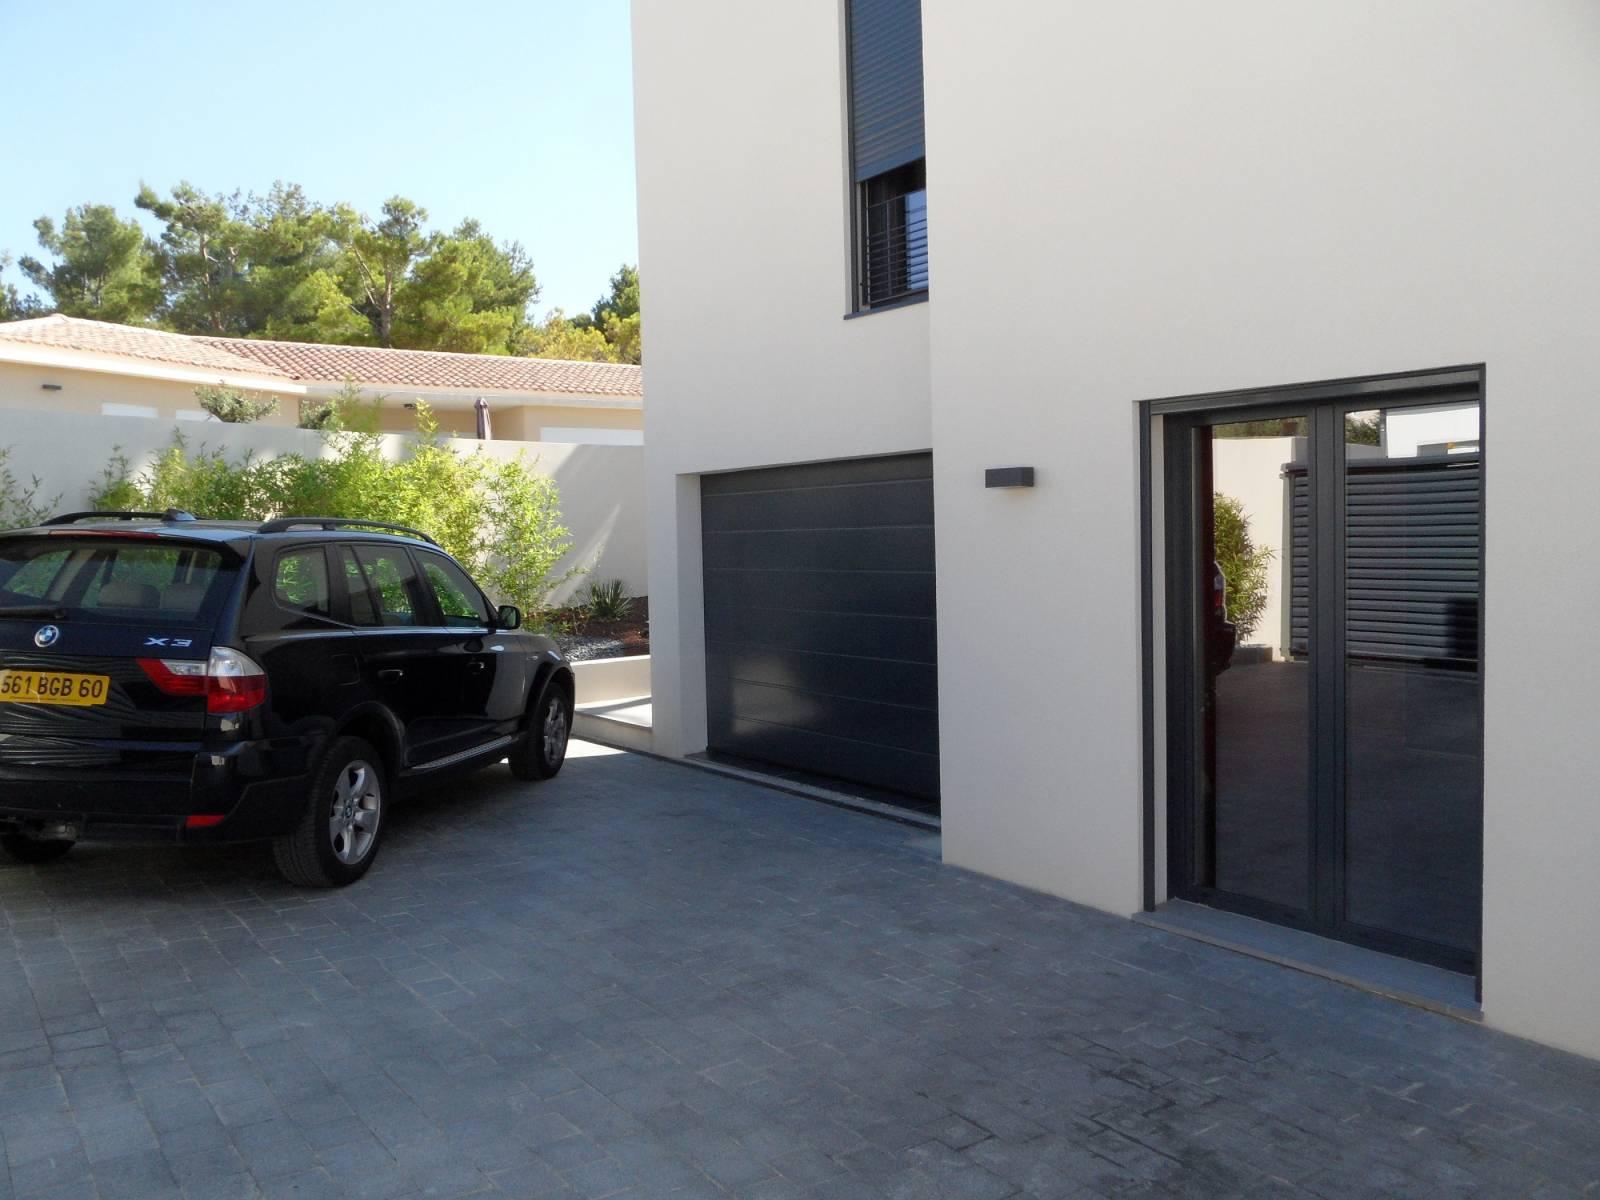 porte de garage enroulable motoris e sur mesure install e. Black Bedroom Furniture Sets. Home Design Ideas